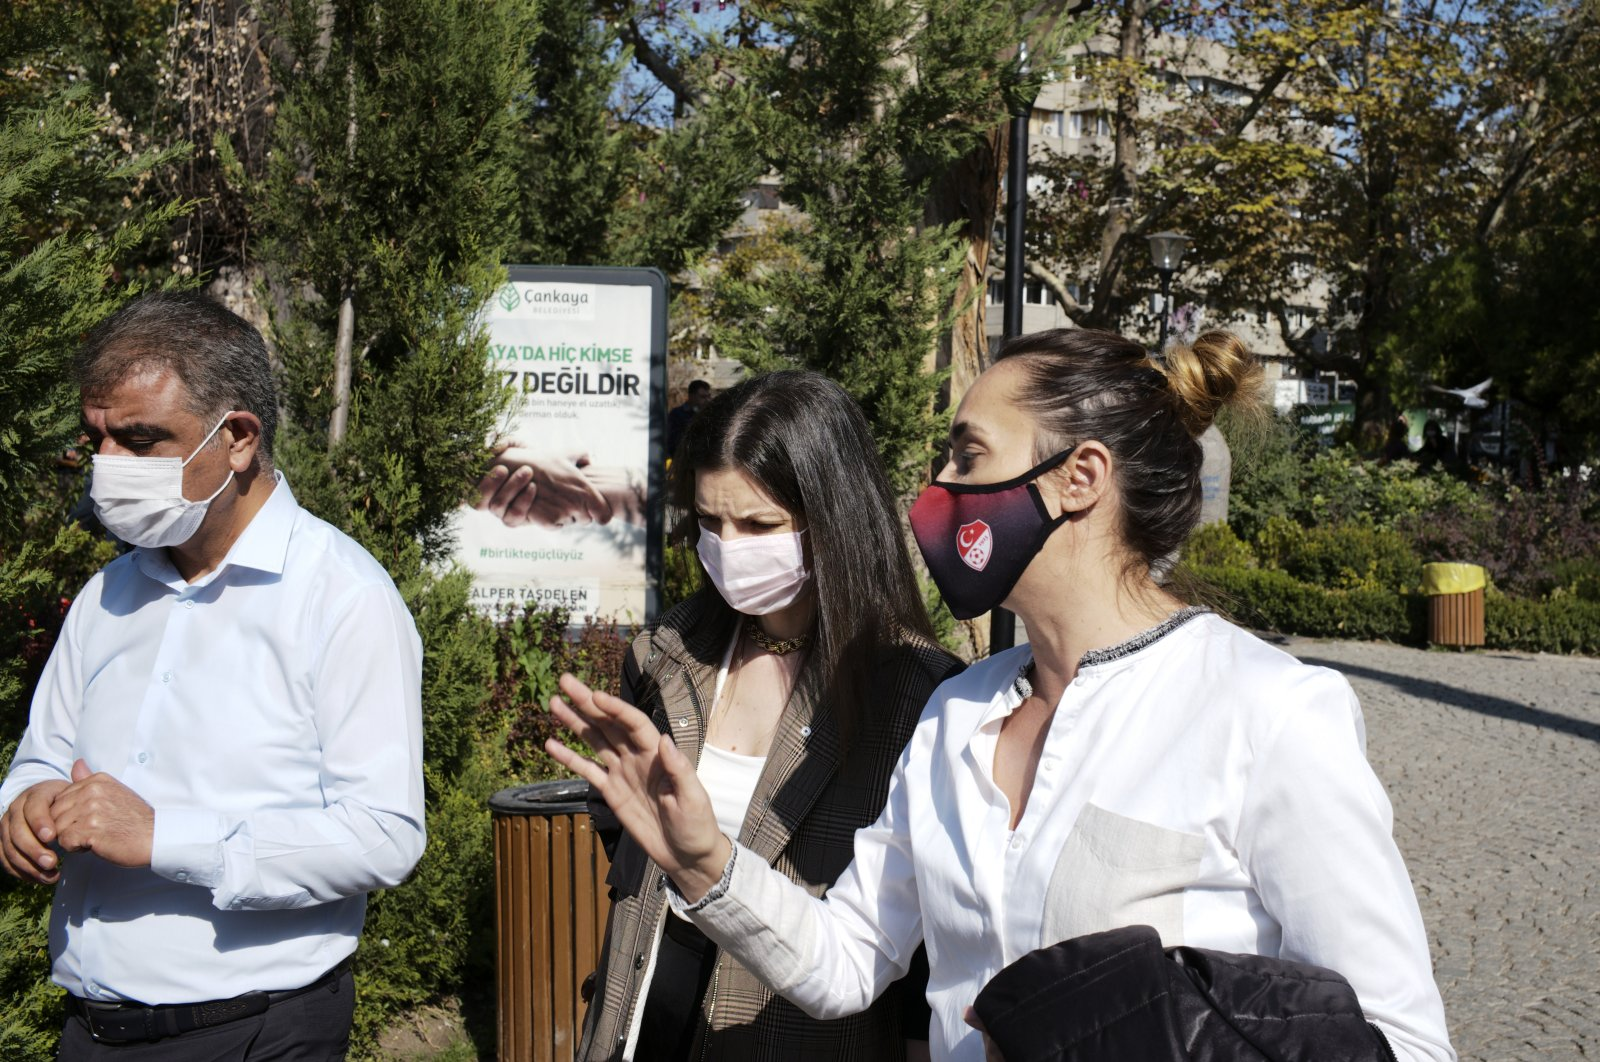 People wearing masks to help protect against the spread of coronavirus, walk in Ankara, Turkey, Friday, Oct. 23, 2020. (AP Photo)